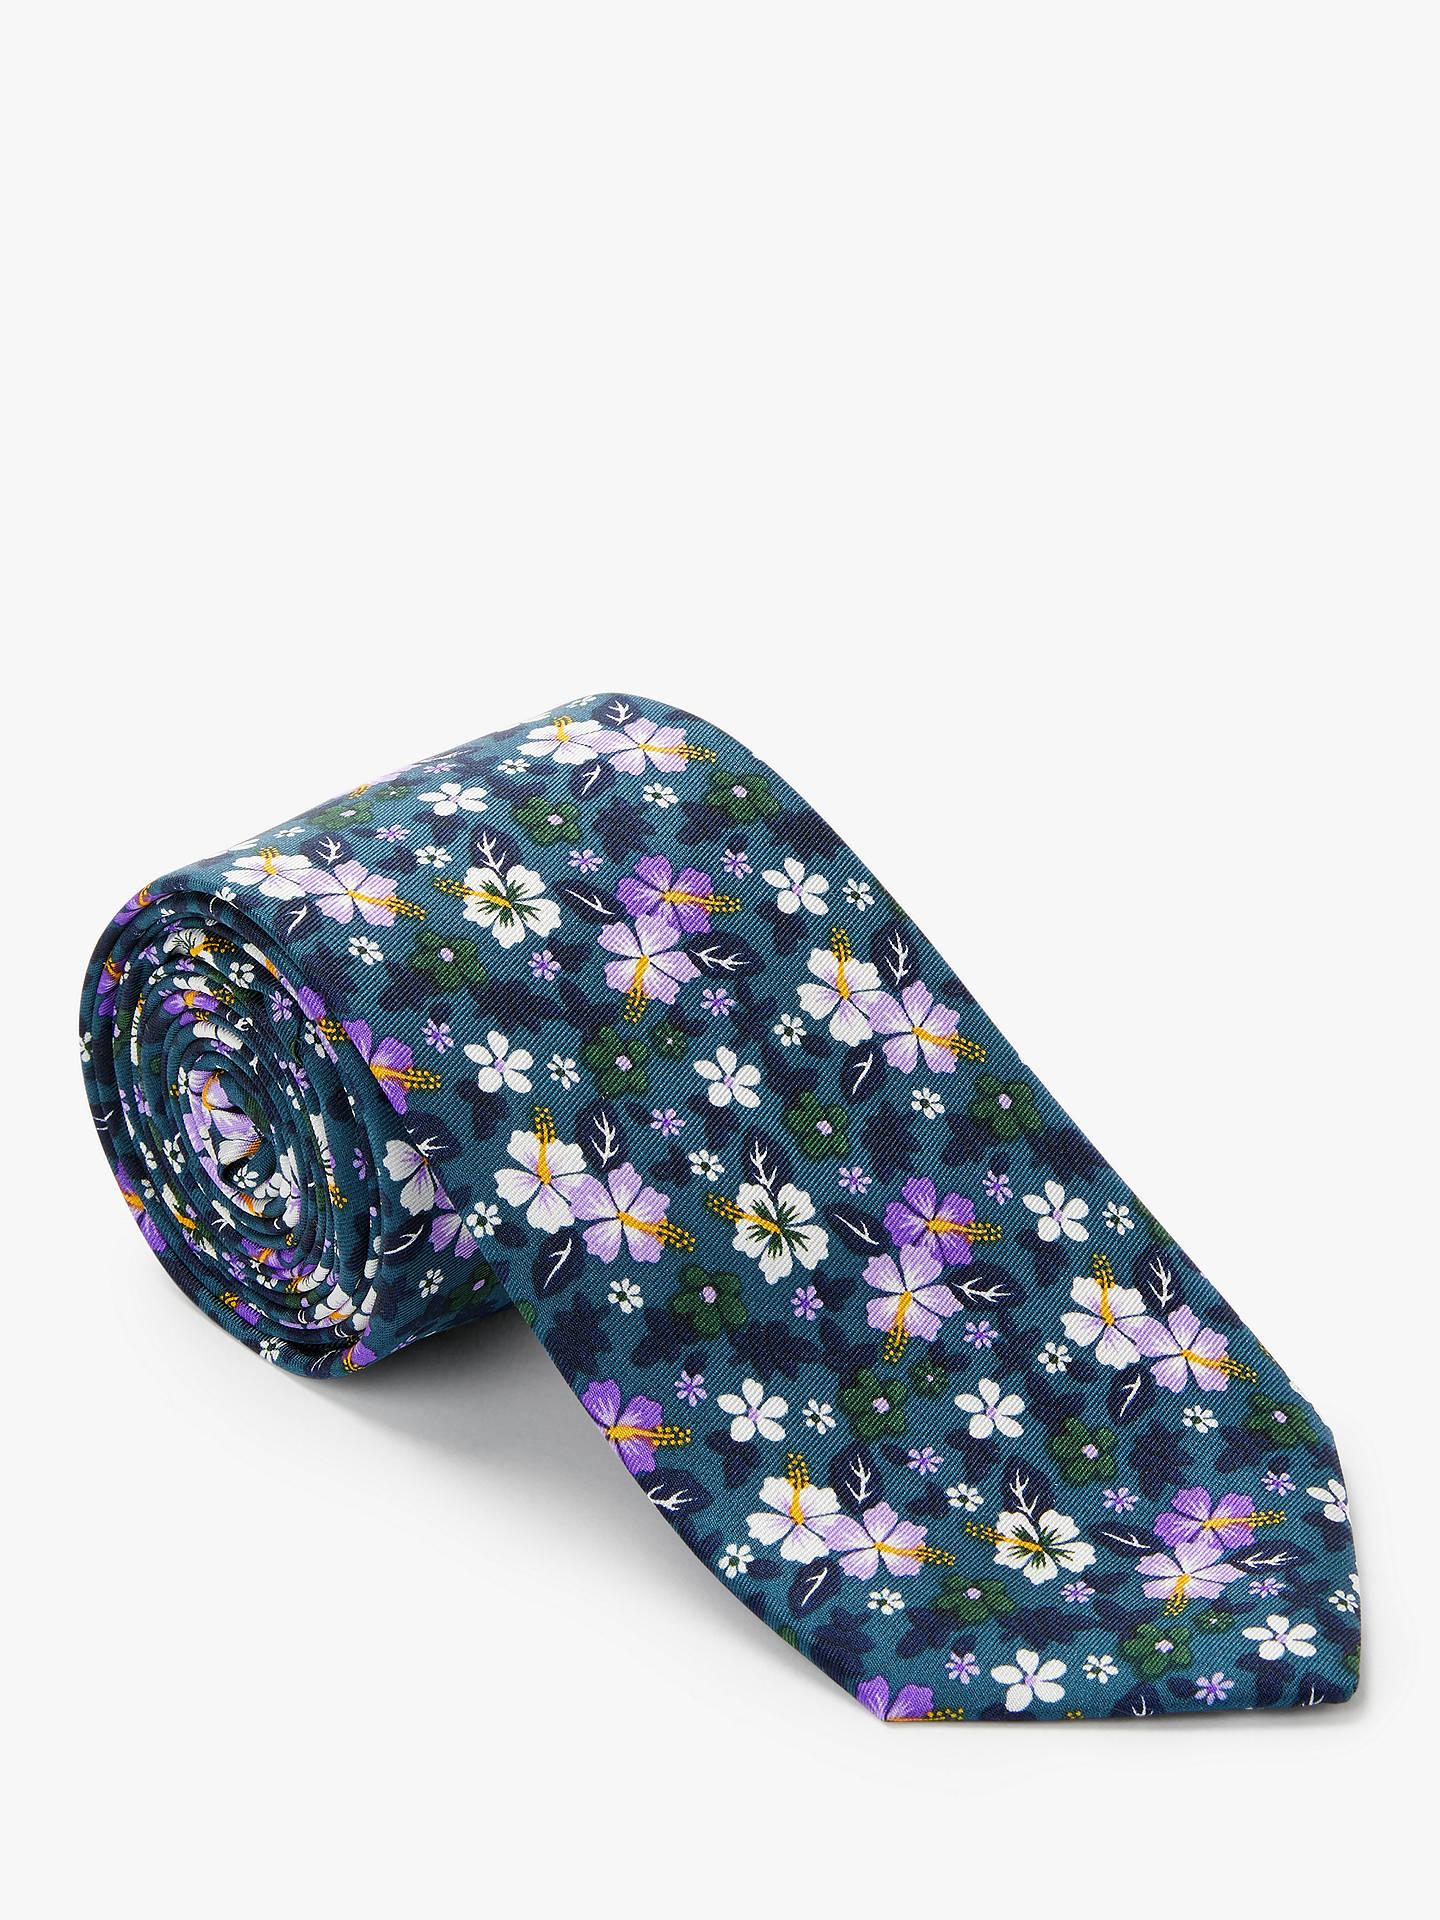 b67a3904415a Buy John Lewis & Partners Printed Floral Silk Tie, Teal Online at  johnlewis. ...